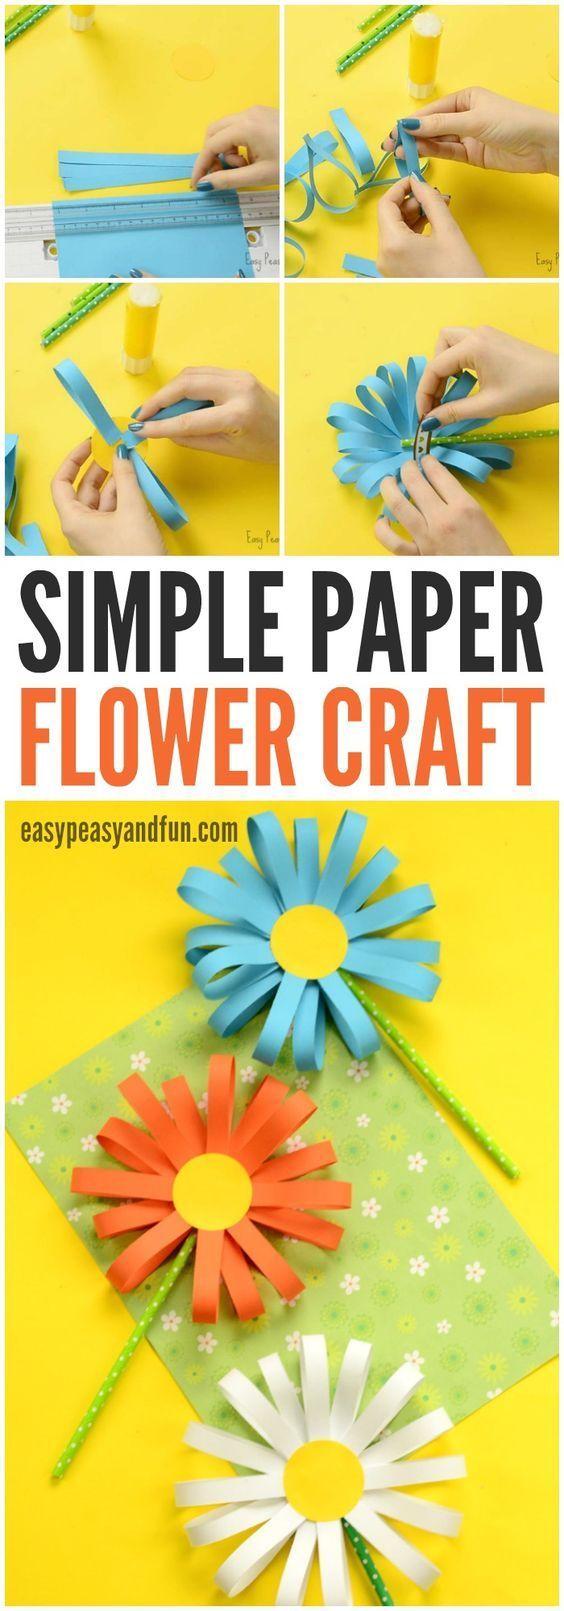 Paper flower craft flower crafts flower and crafts simple paper flower craft a great springtime craft for older kids mightylinksfo